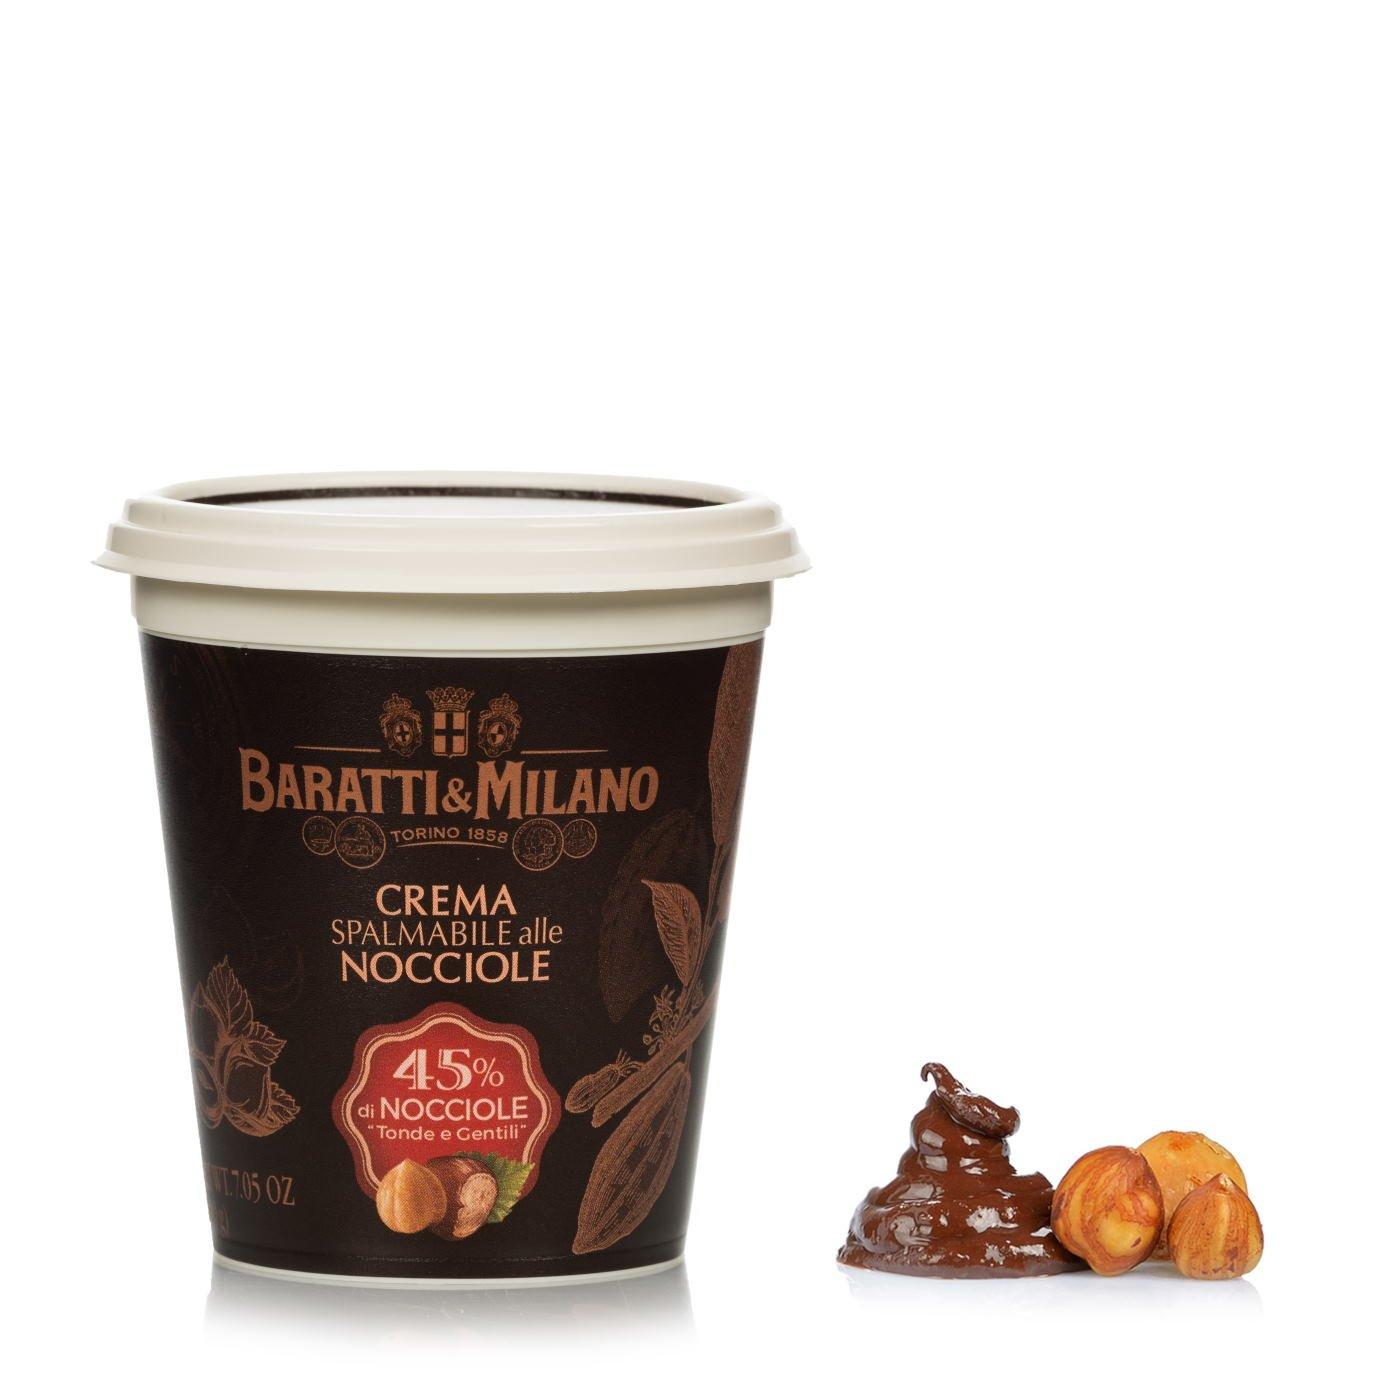 Nutella Hazelnut Spread With Cocoa 200gr Daftar Harga Terbaru Ferrero Selai Coklat 350g Cream 200g